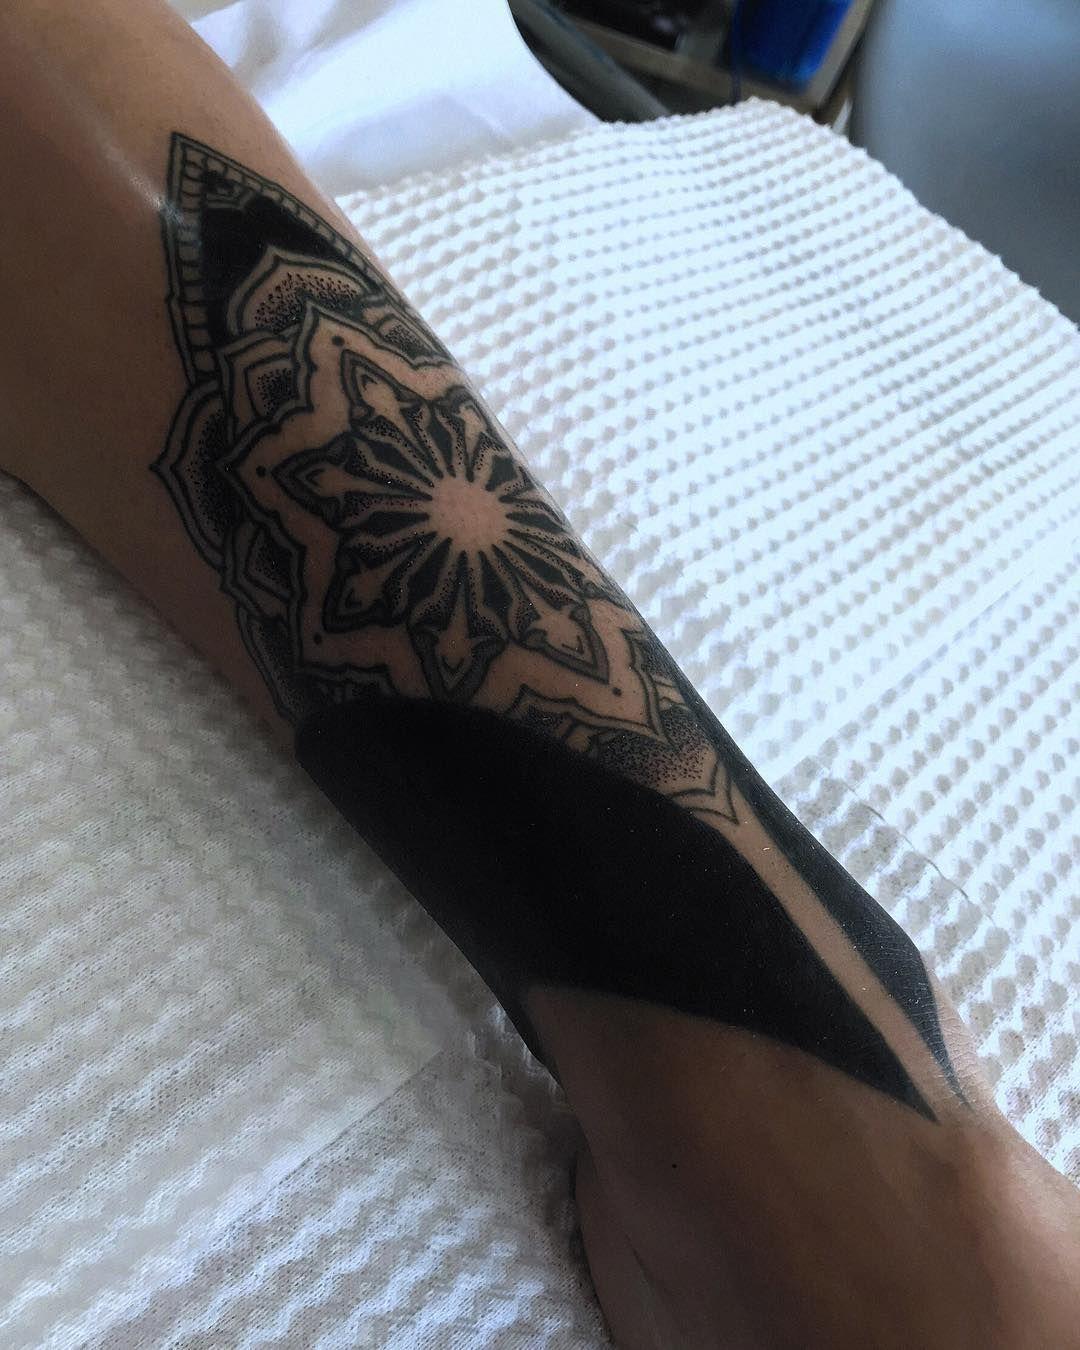 It's been a long time coming, covering up an old bad tattoo for my girlfriend @valdelosandes - Thanks for always trusting me! - #blackwork #blackworkers #iblackwork #blackworkerssubmission #geometrictattoohunter #geometrip #mandala #mandalatattoo #ink #dotwork #geometrictattoo #cusco #pisac #sacredvalley #peru #perutattoo #vallesagrado #pisactattoo